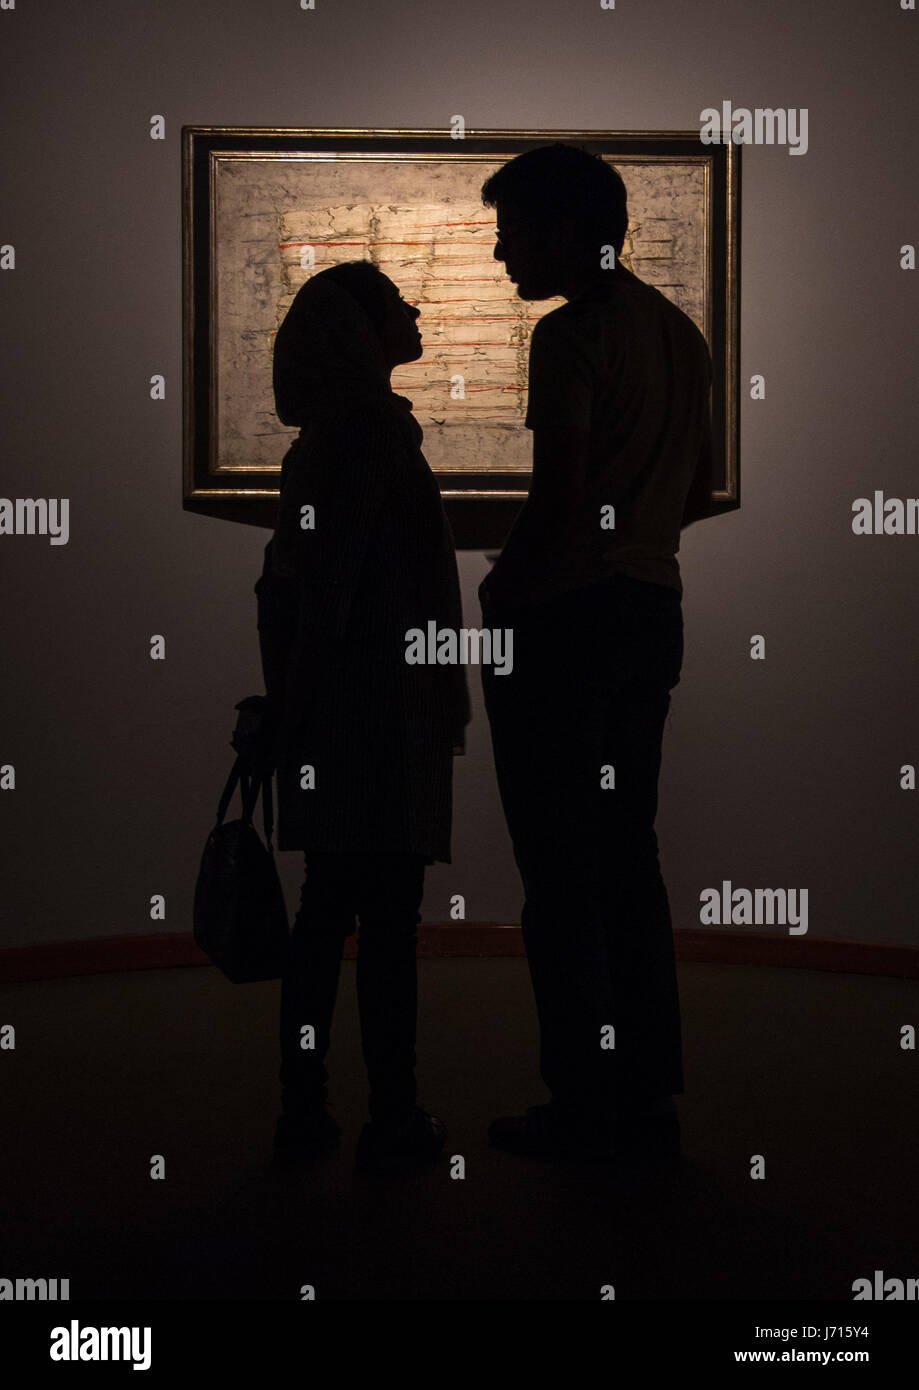 Man & woman in Tehran Museum of Contemporary Art, Iran - Stock Image